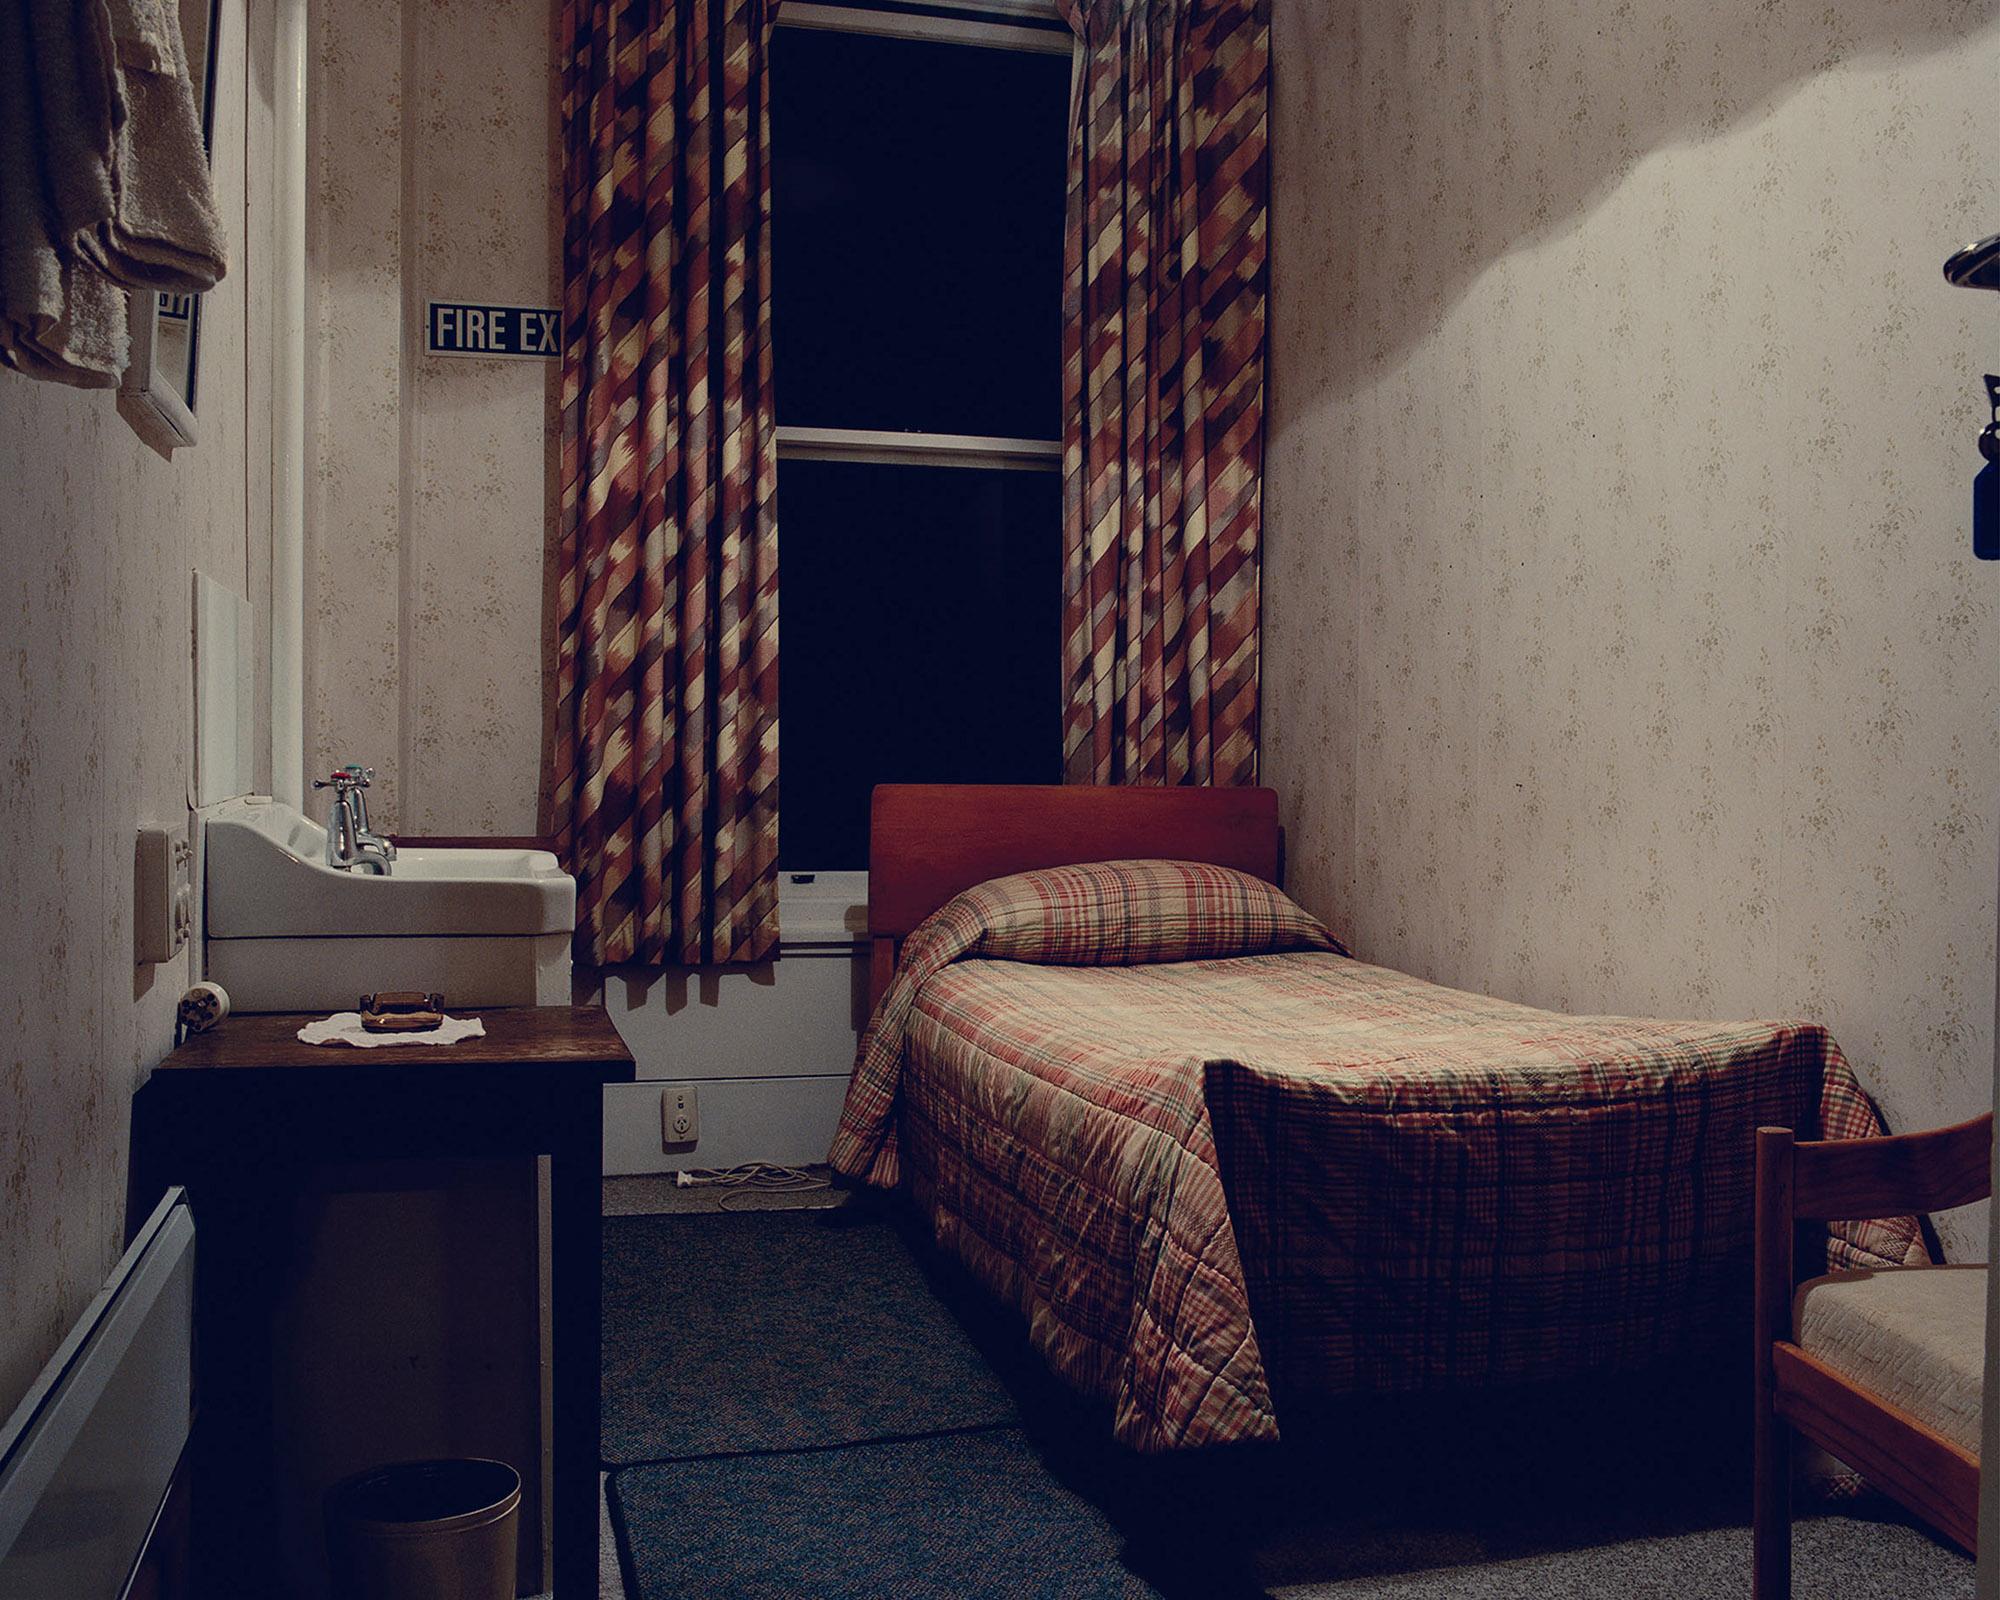 Room 1, Lumsden Hotel, 6 Diana St, Lumsden, Southland, New Zealand 2004. © Alan McFetridge